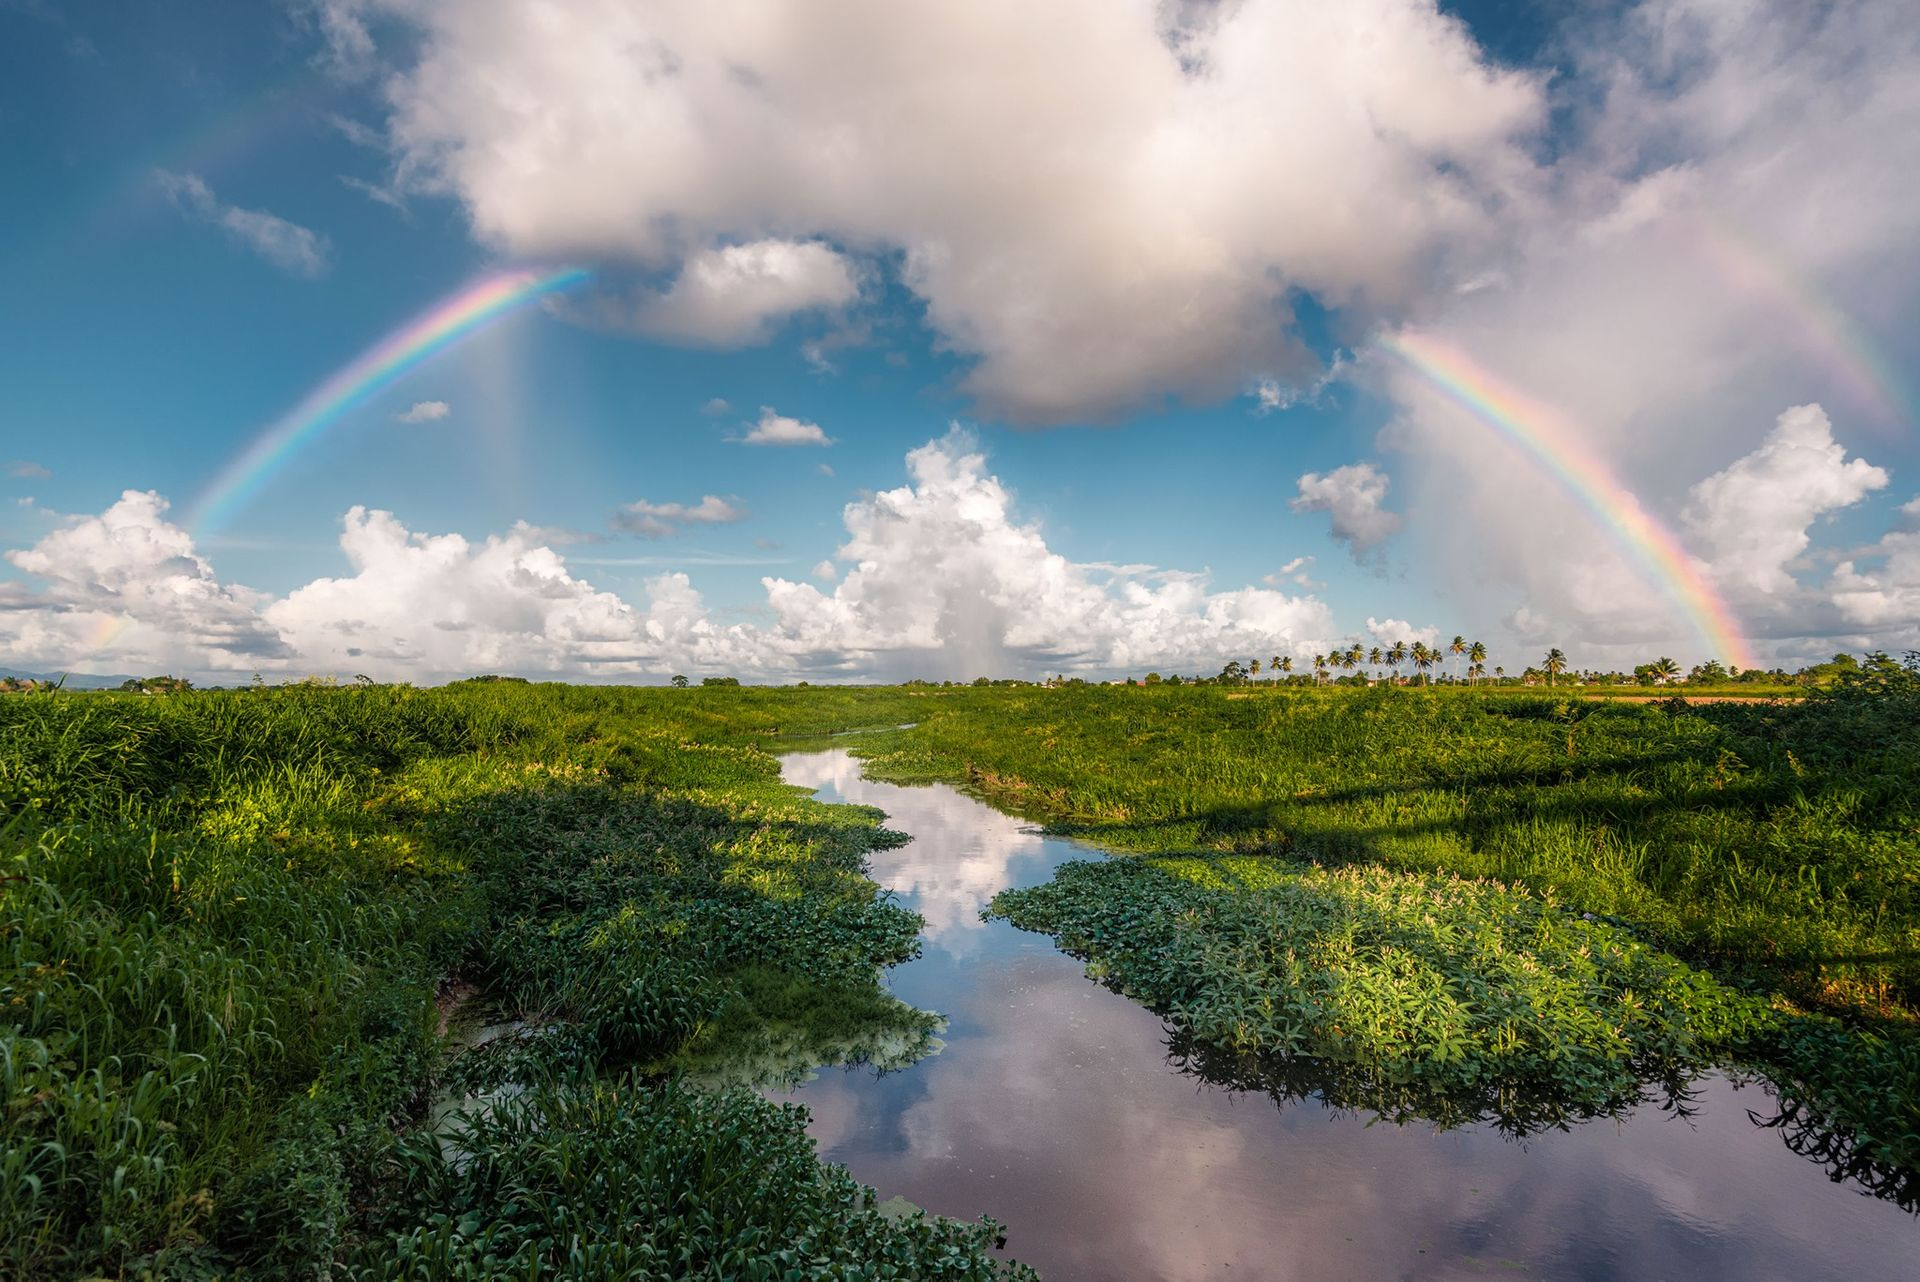 Фото — «Двойная радуга над равнинами Карони». Карони, Тринидад и Тобаго. Автор — Ziad Joseph.